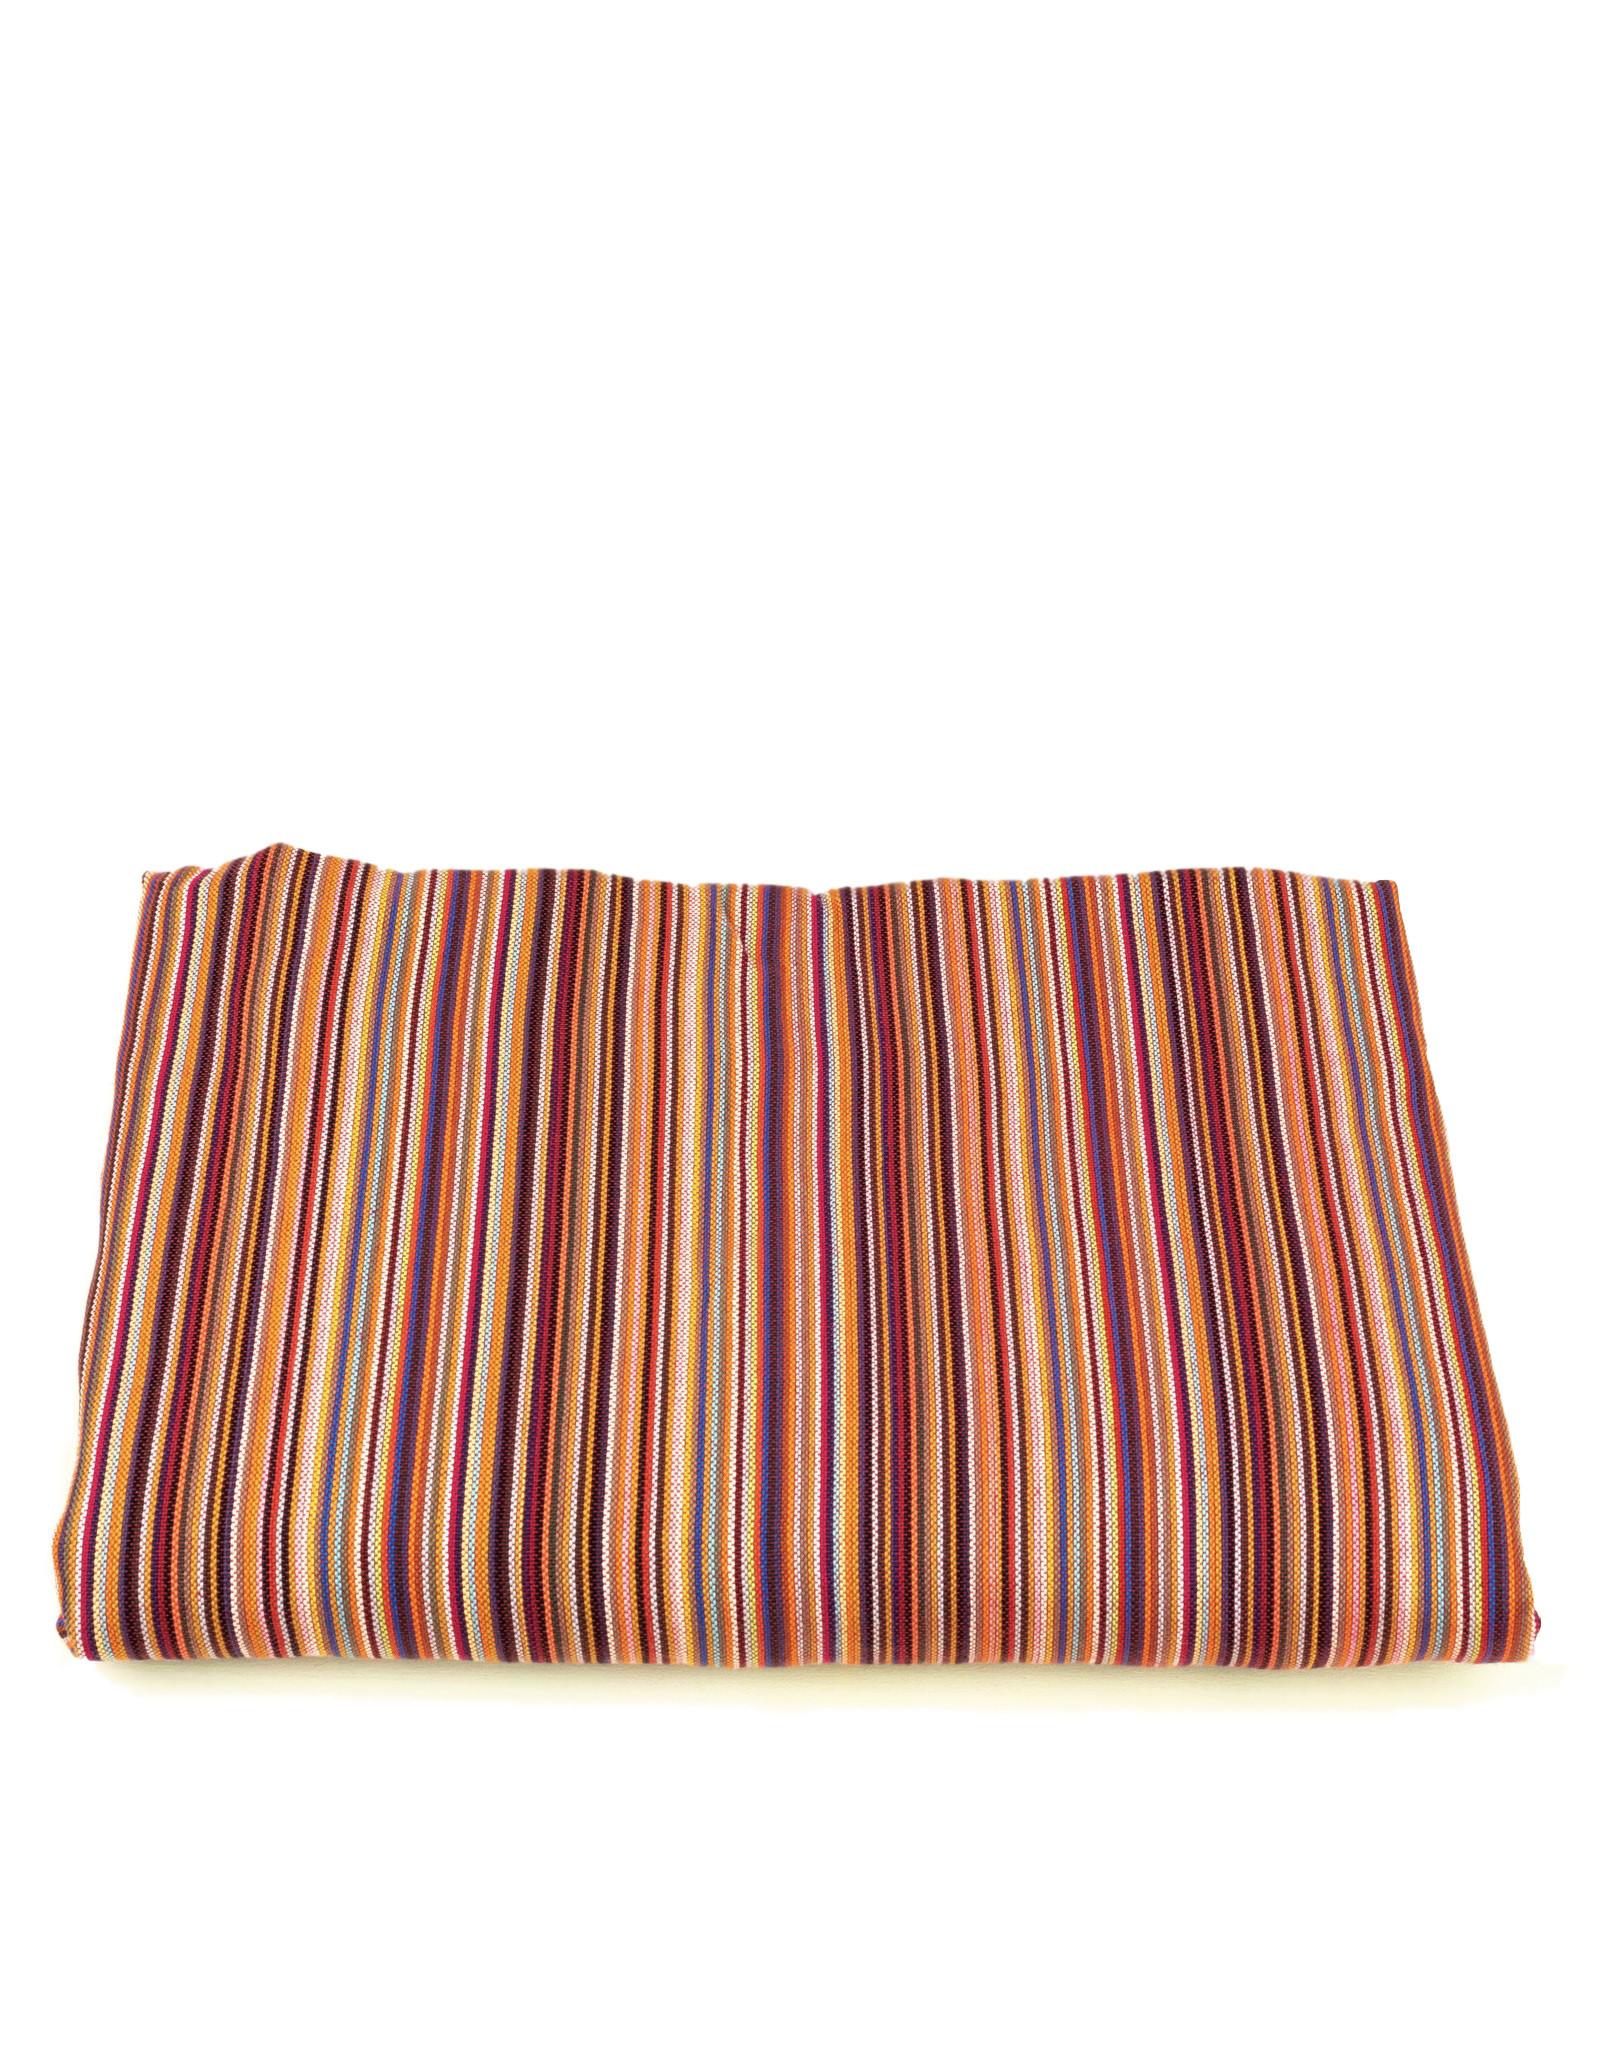 Maisha.Style Kikoy towel - stripey red with orange towel lining